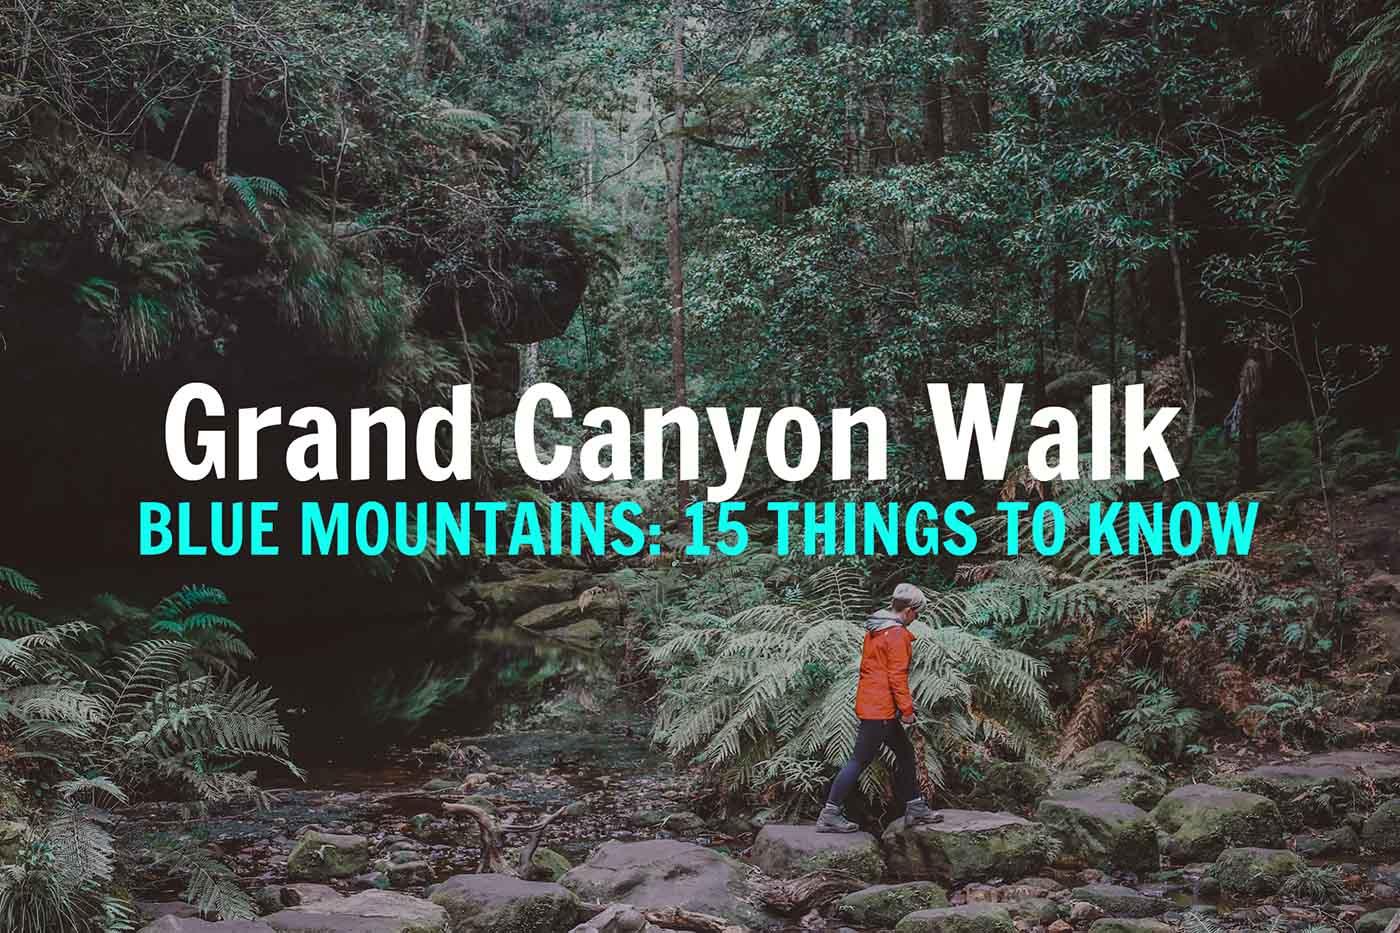 GRAND-CANYON-WALK-blue mountains